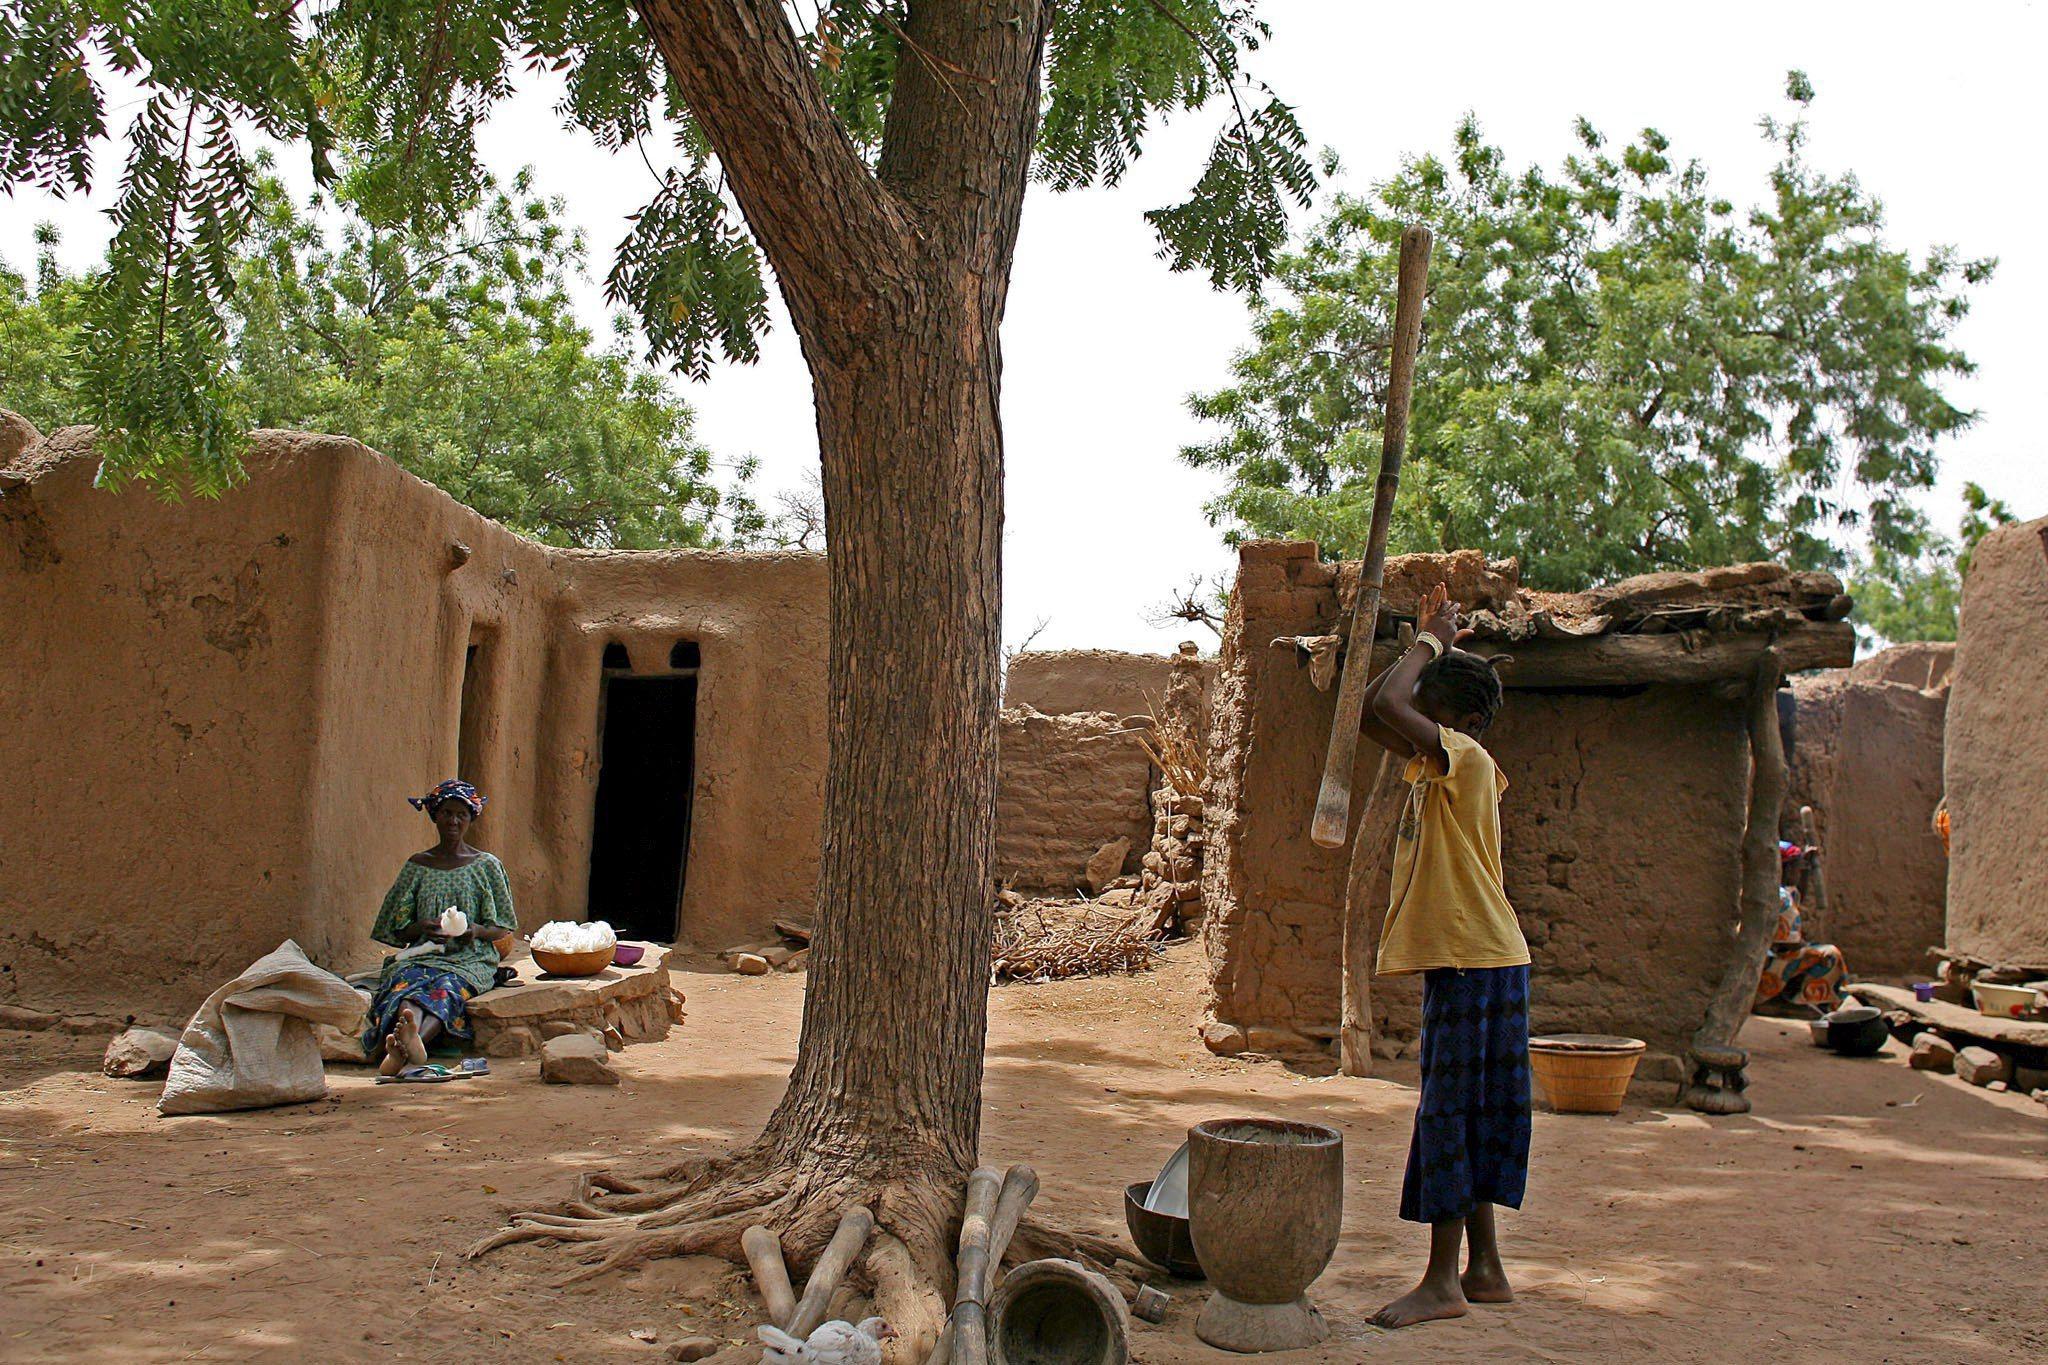 Mali, Africa - Tourist Destinations